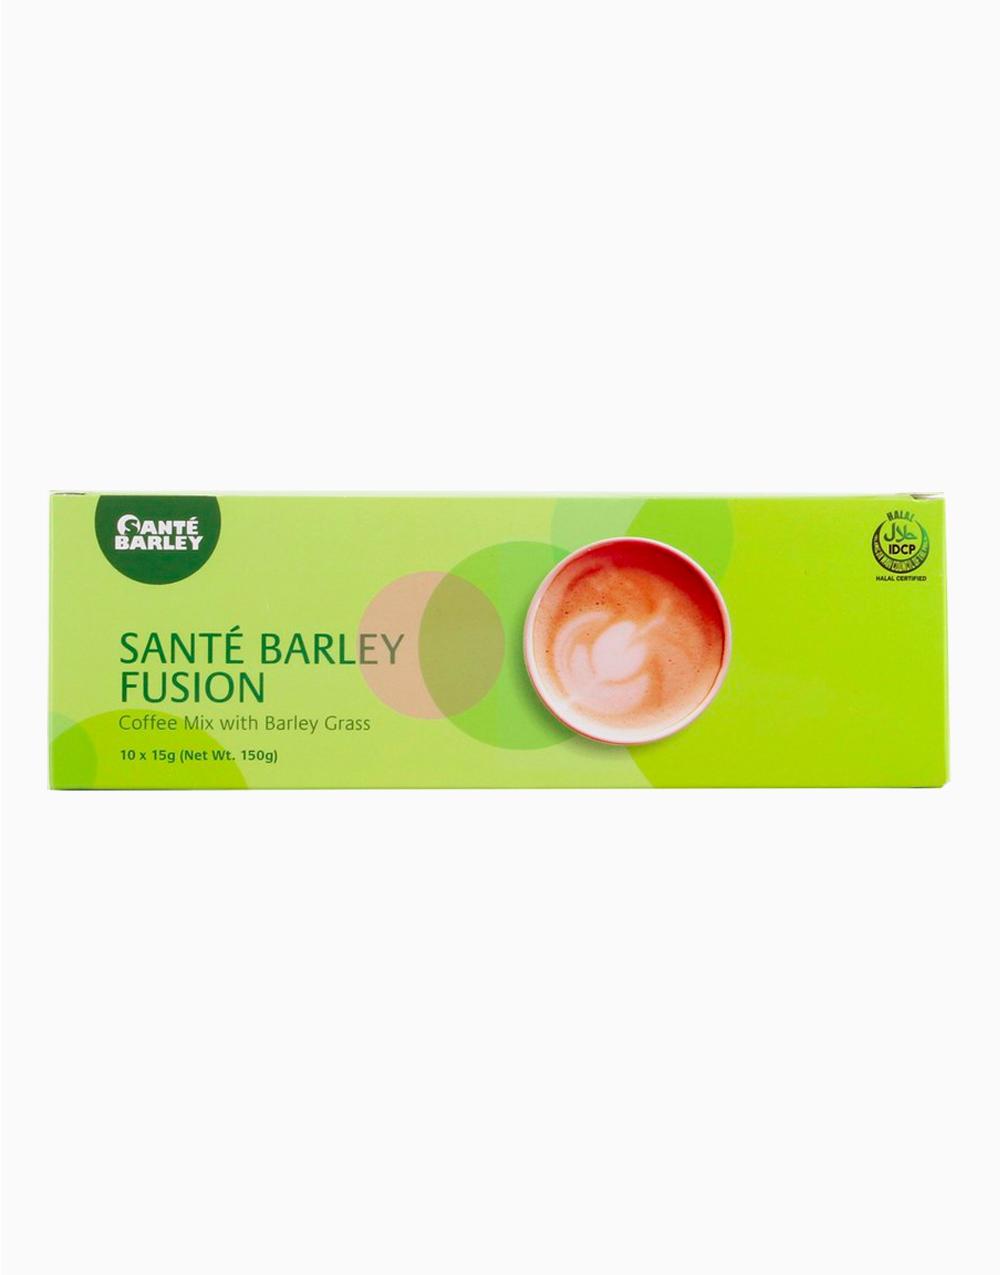 Santé Barley Fusion Coffee Mix with Barley Grass (10 Sachets) by Santé Barley